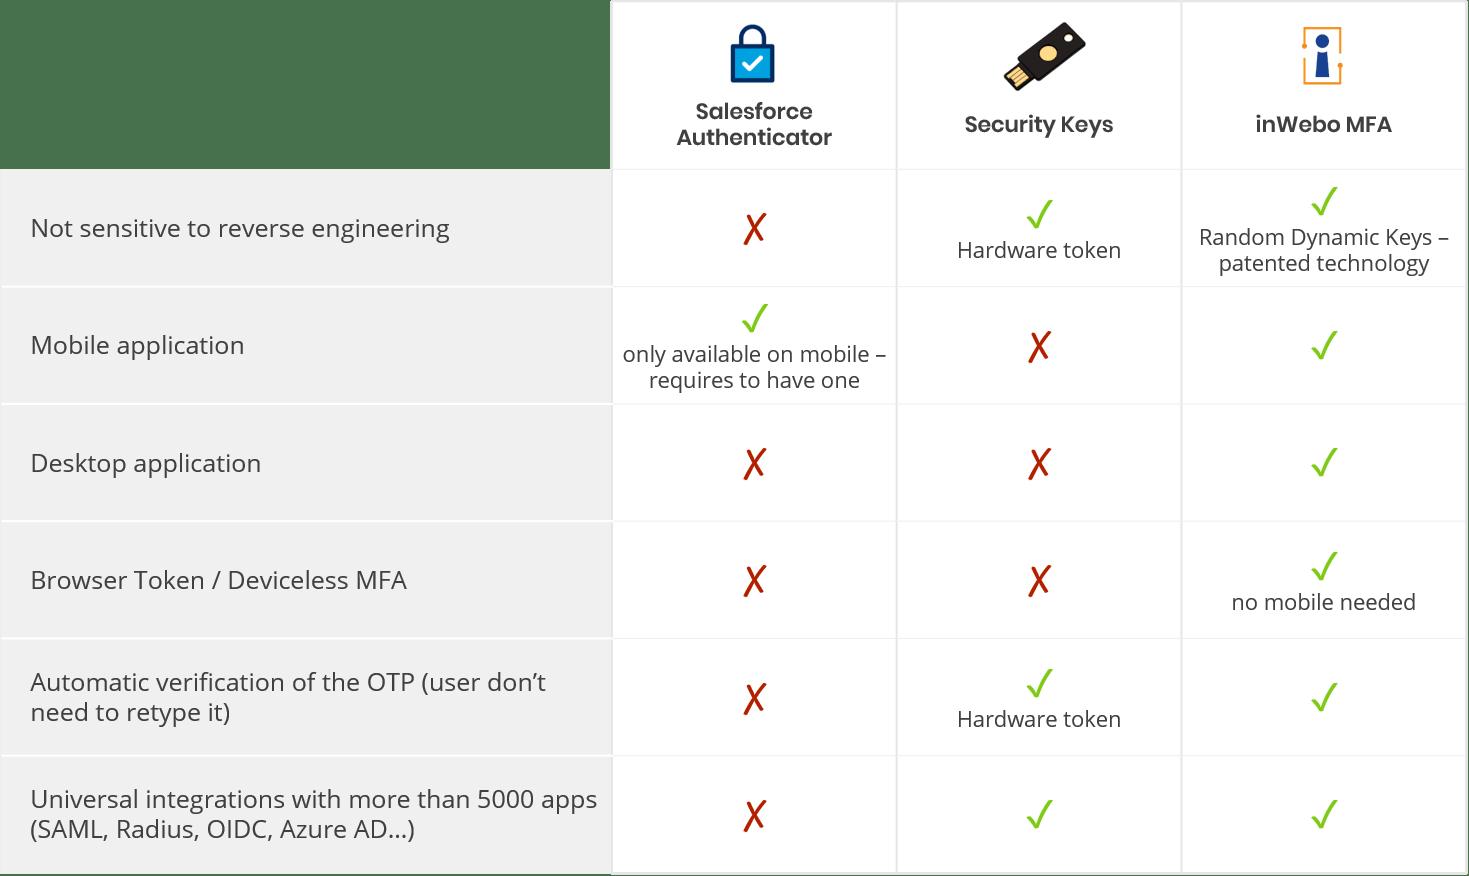 inWebo vs Salesforce Authenticator